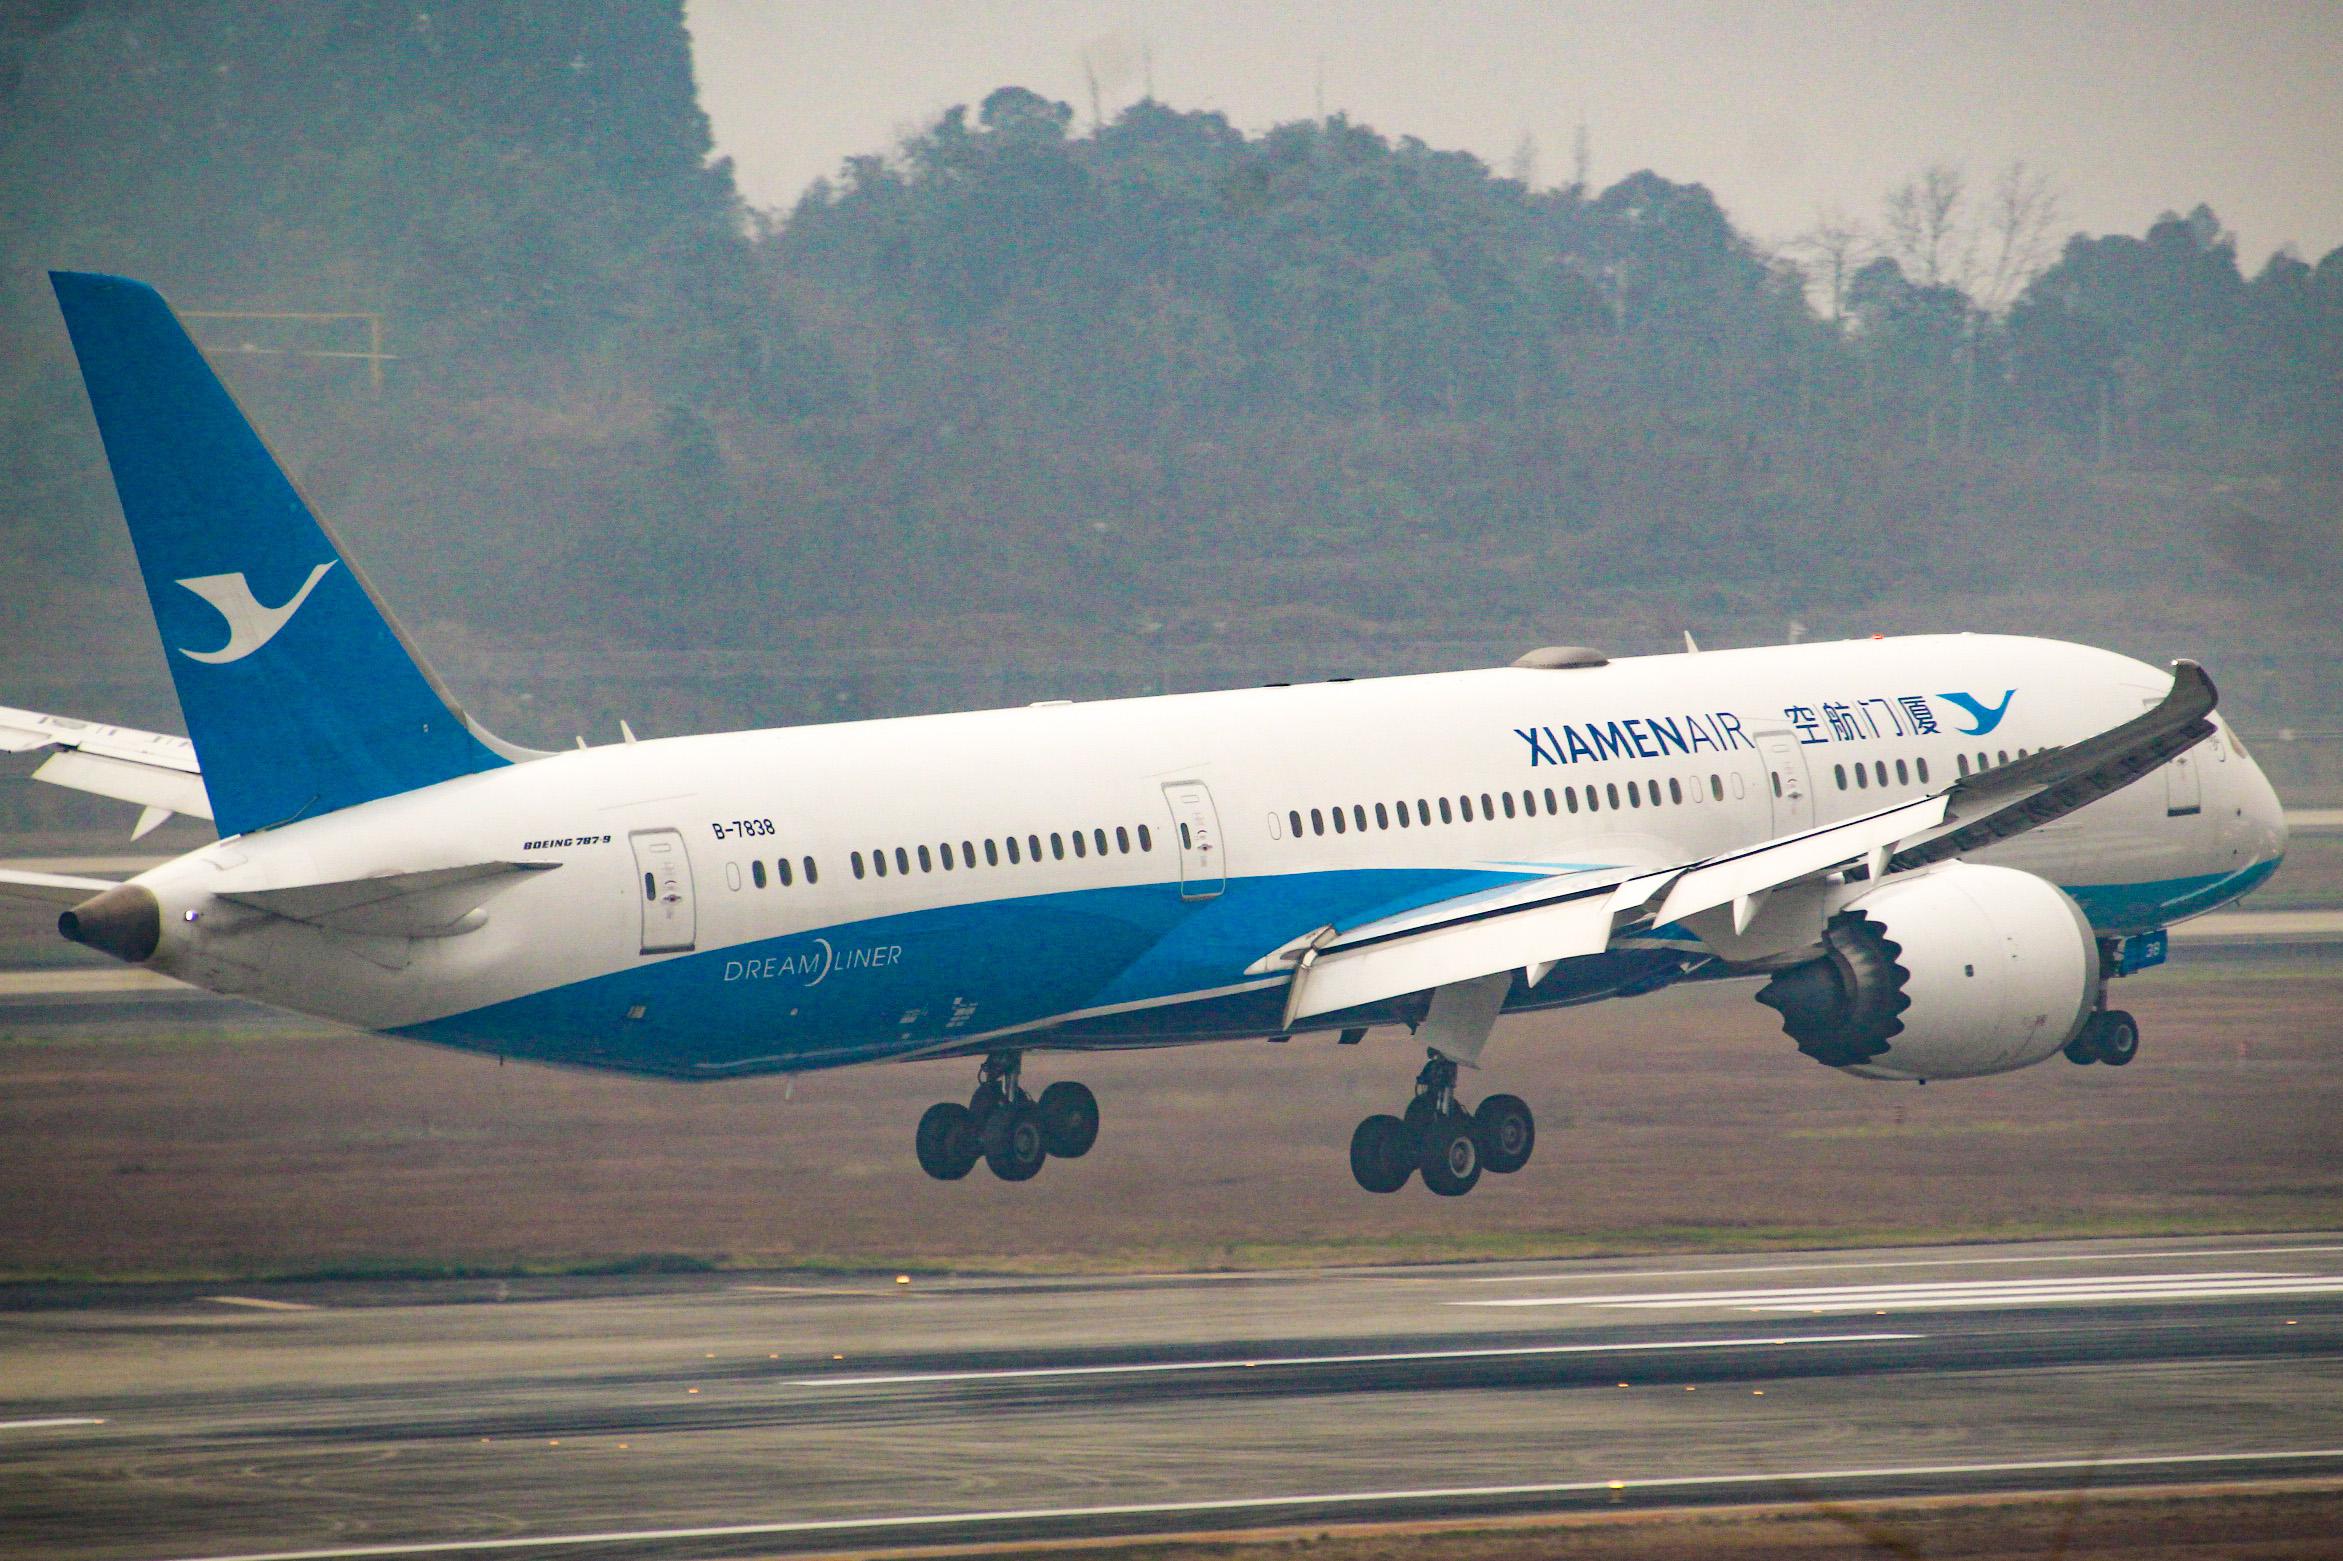 CTU水泥天拍机,验证烂天好货的铁律 BOEING 787-9 B-7838 中国成都双流国际机场